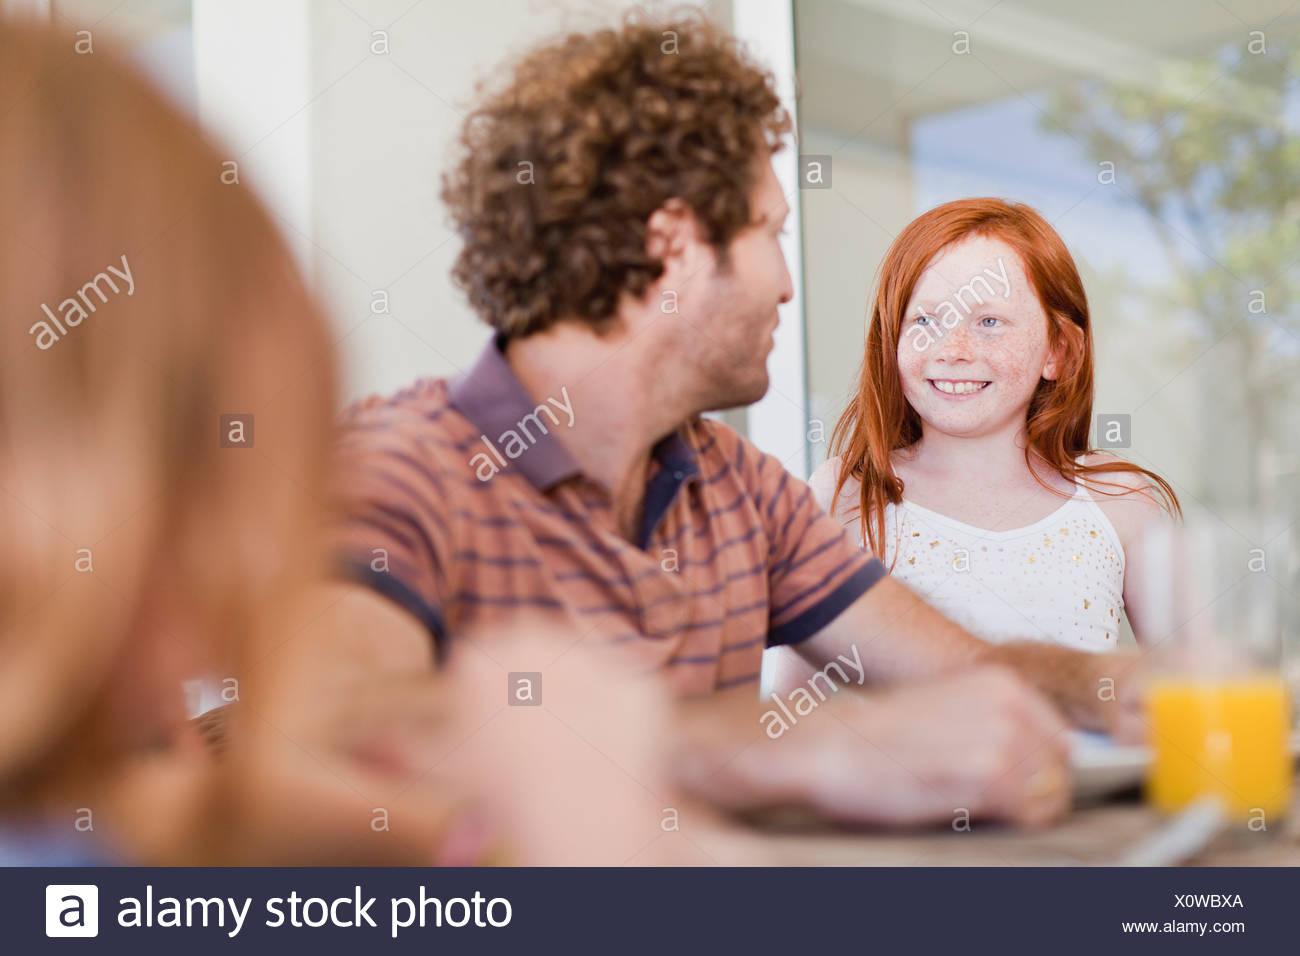 Mädchen lächelte Vater beim Frühstück Stockbild